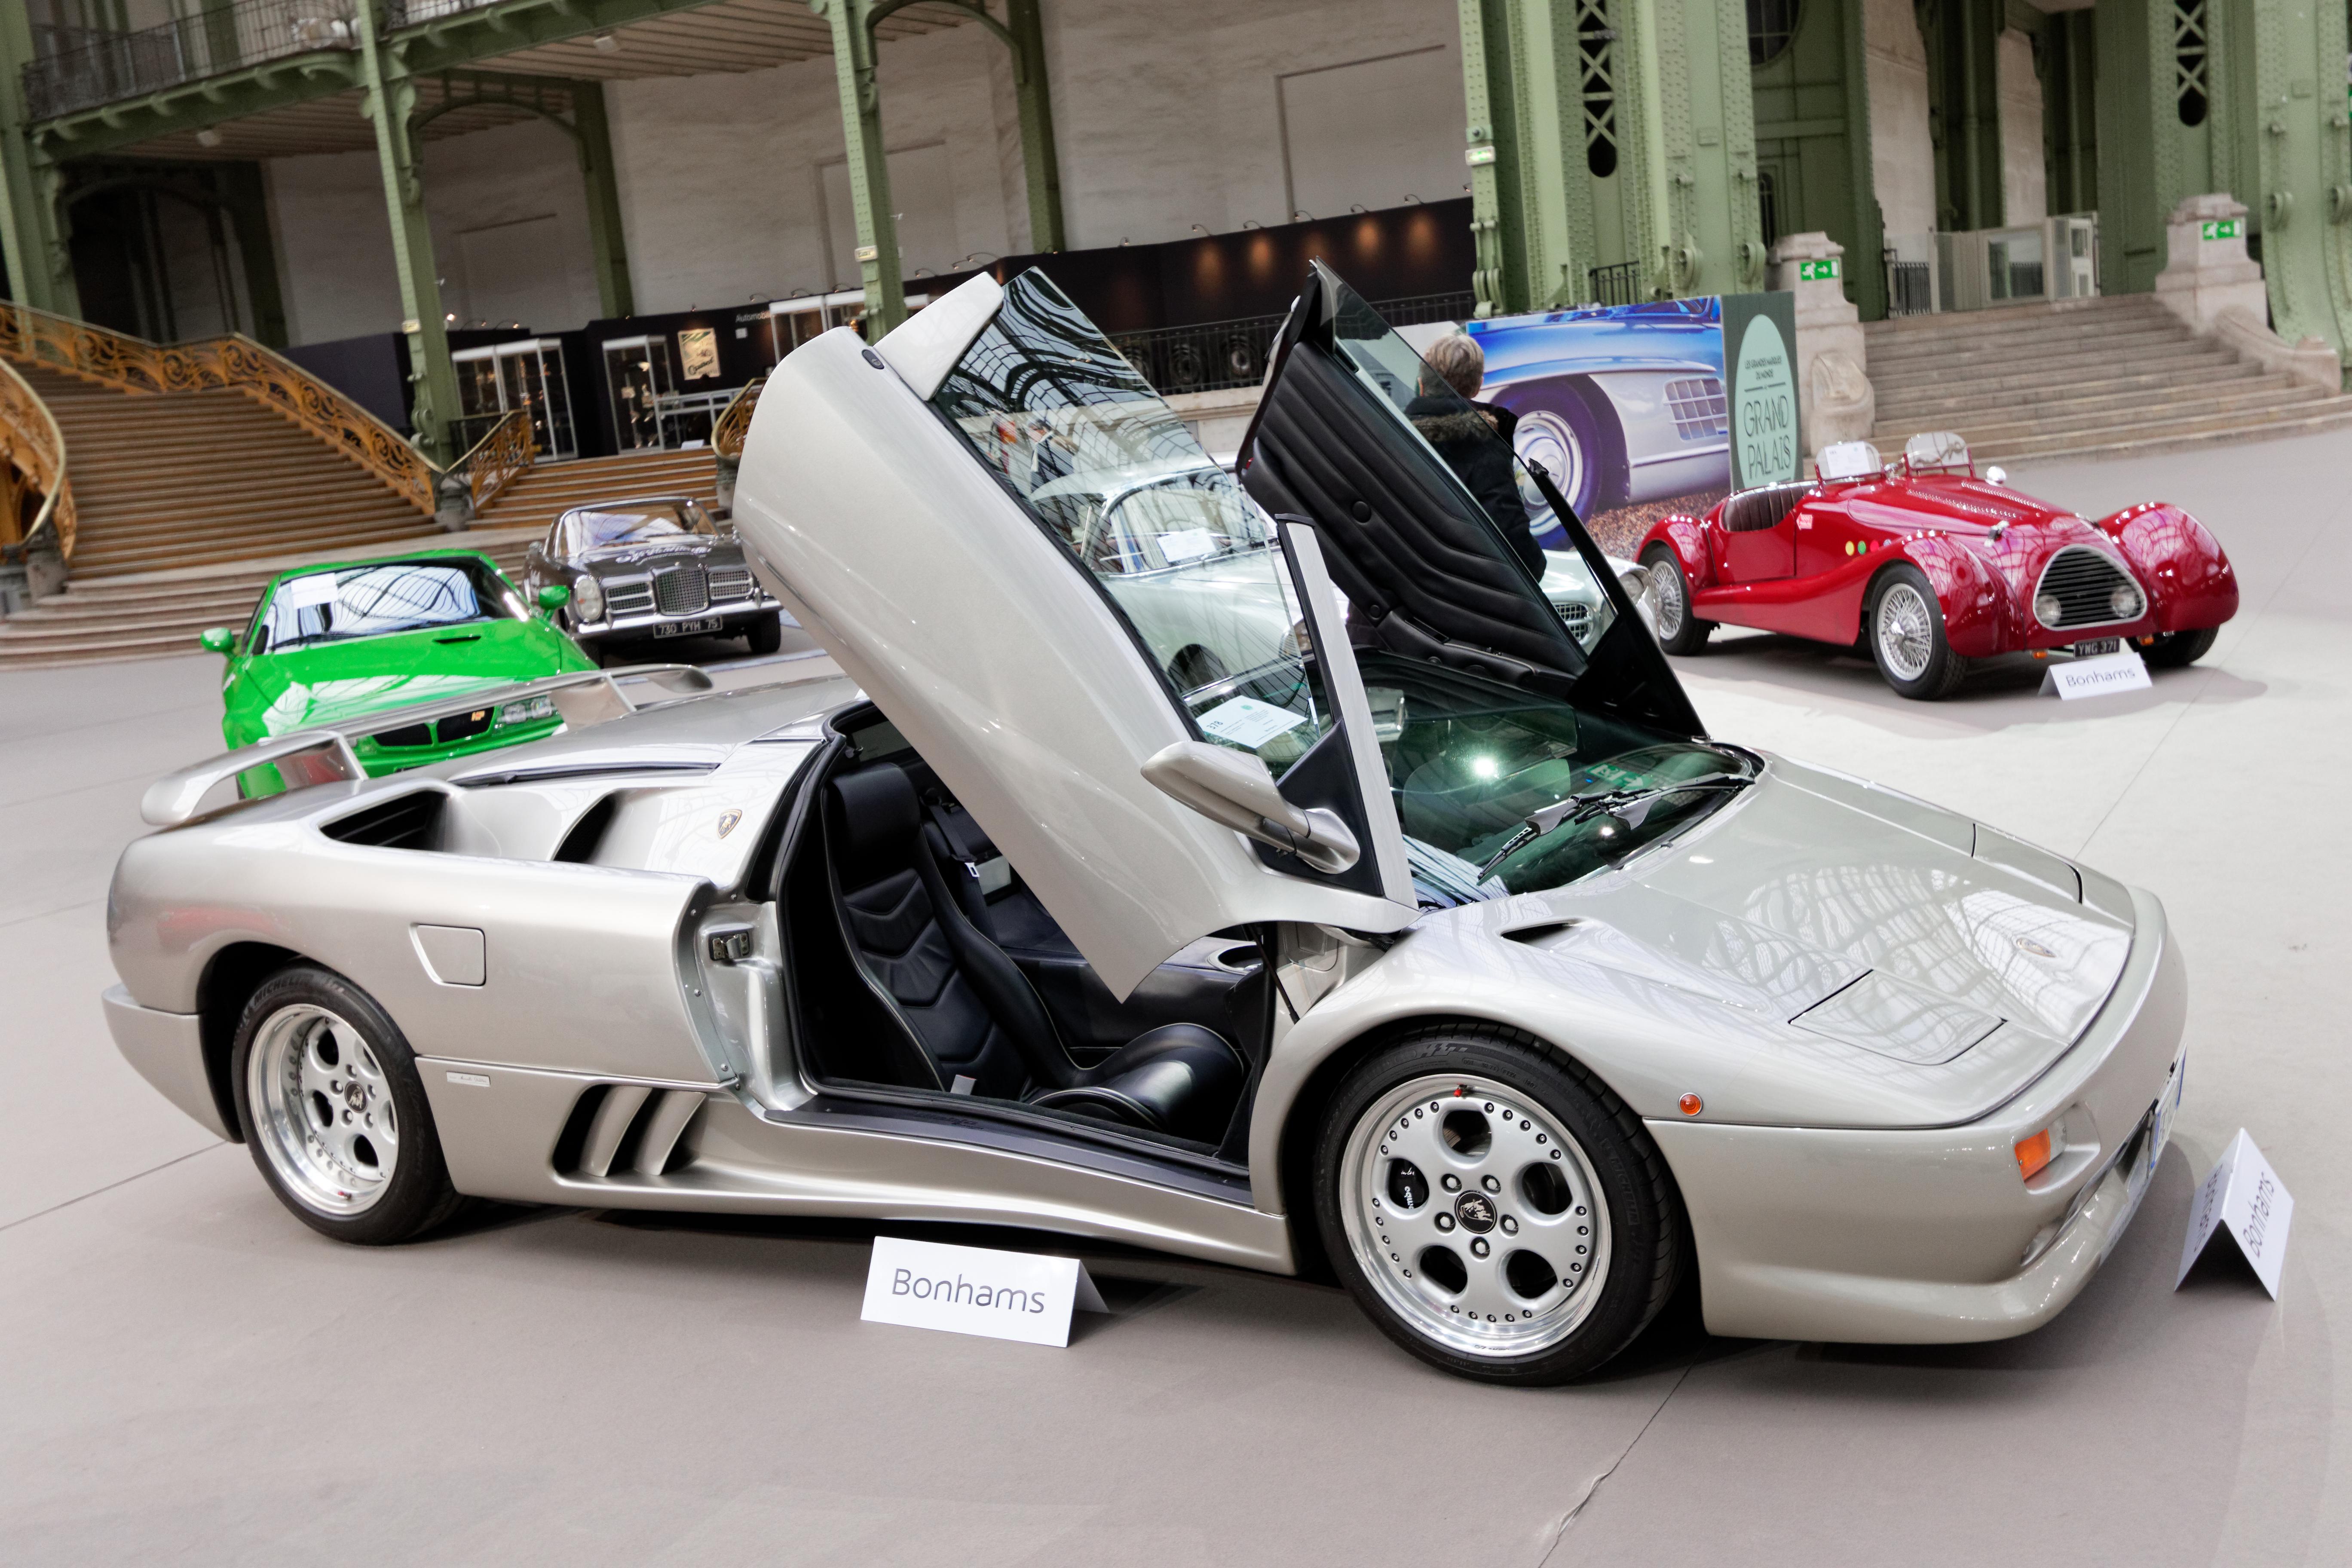 File Paris Bonhams 2017 Lamborghini Diablo Vt Roadster 1997